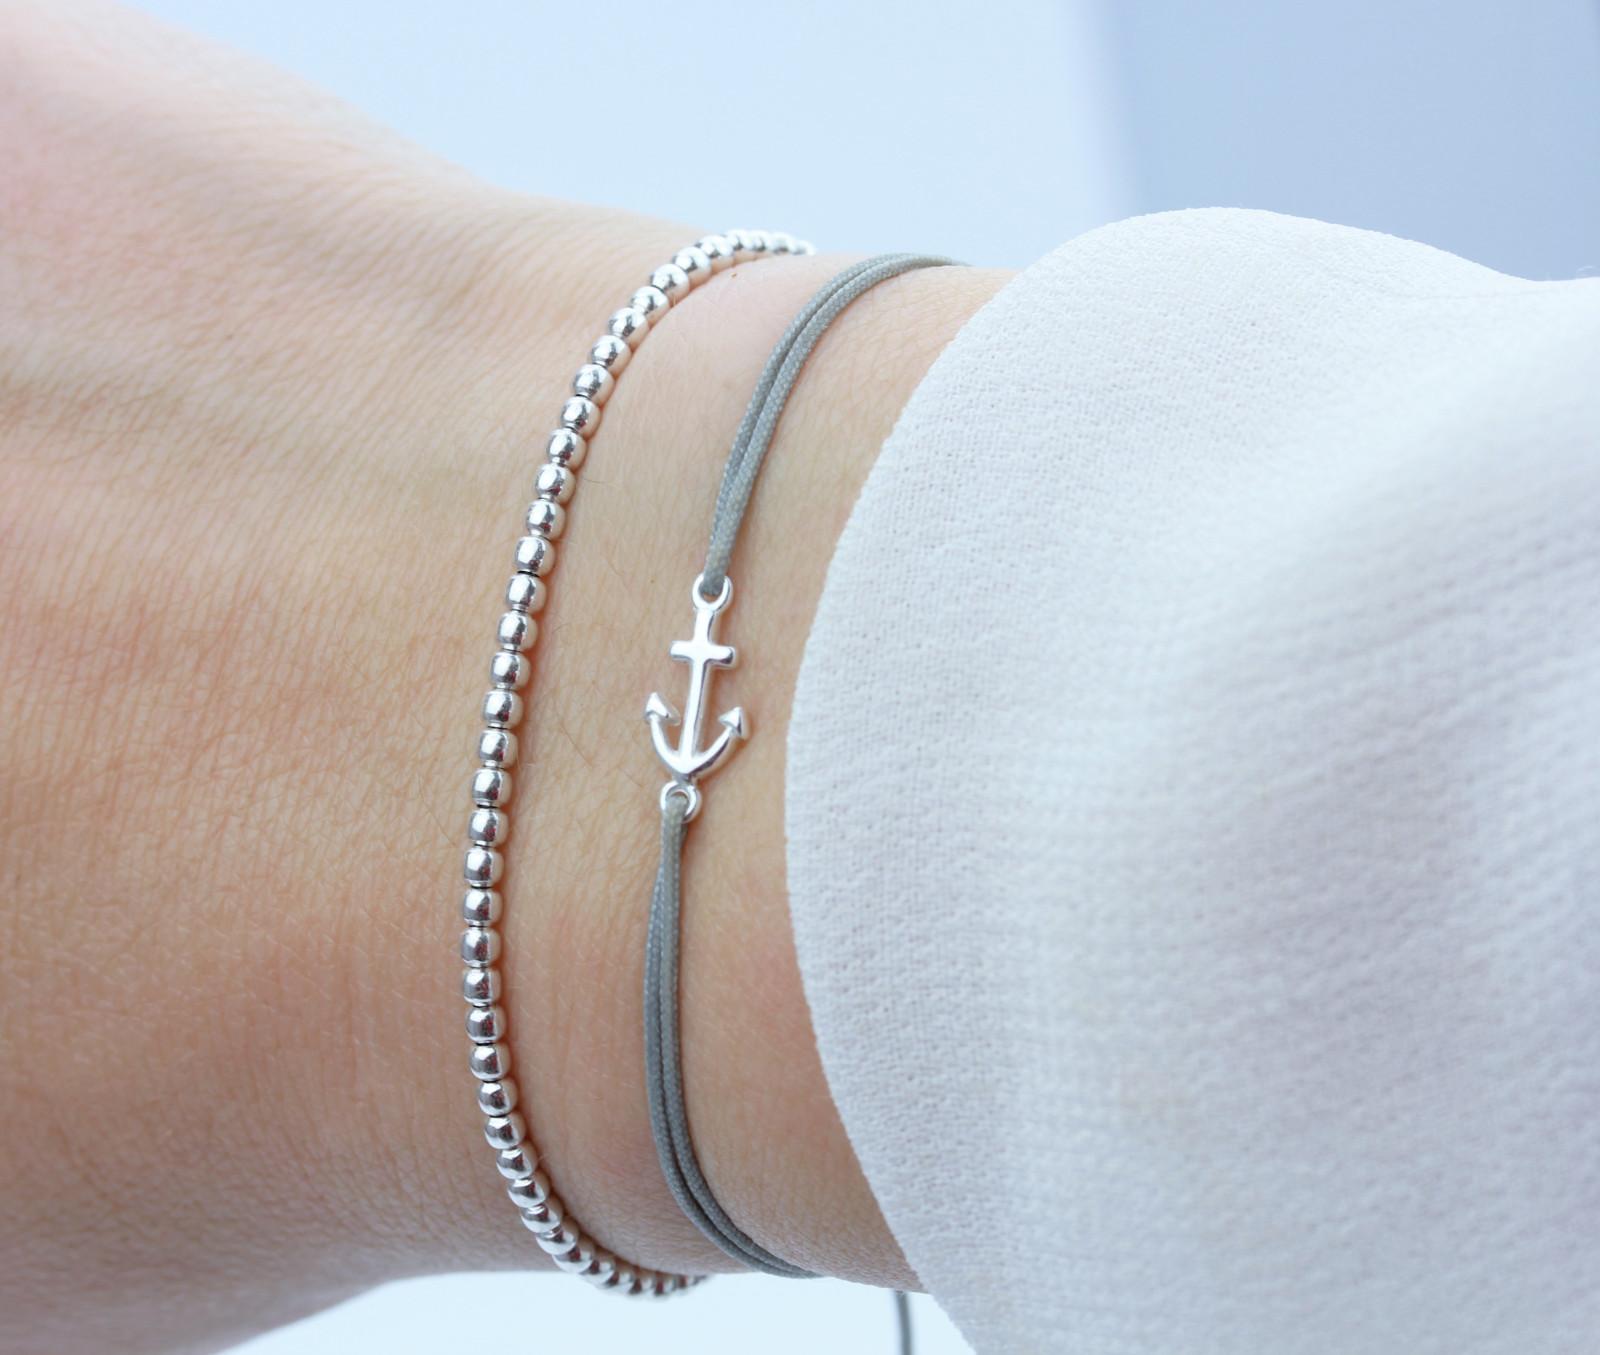 schoschon damen symbol armband set anker silber grau 925 silber. Black Bedroom Furniture Sets. Home Design Ideas